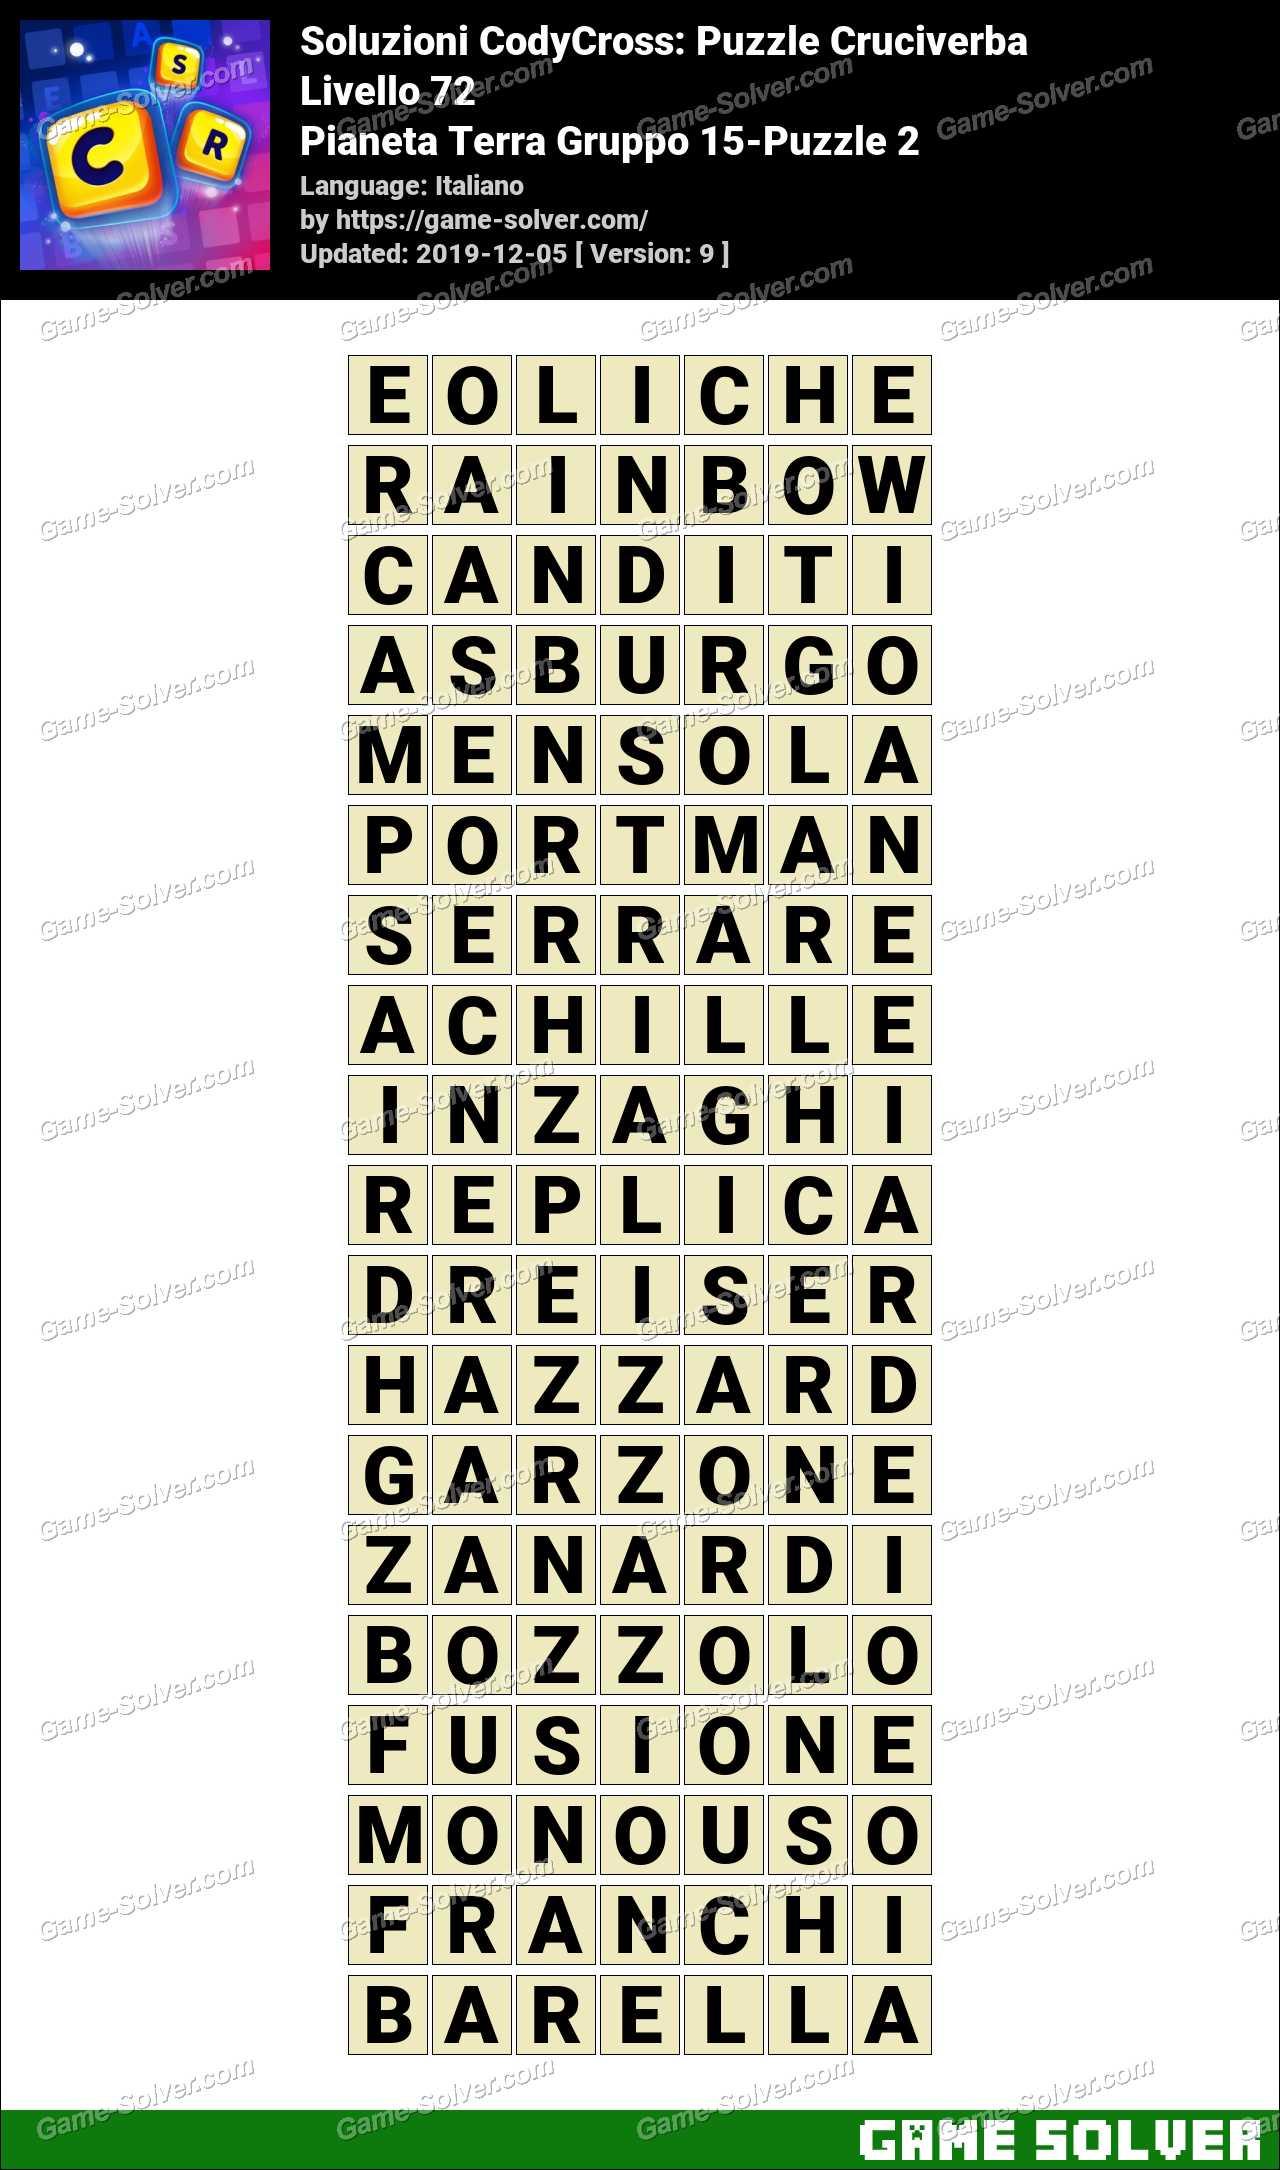 Soluzioni CodyCross Pianeta Terra Gruppo 15-Puzzle 2